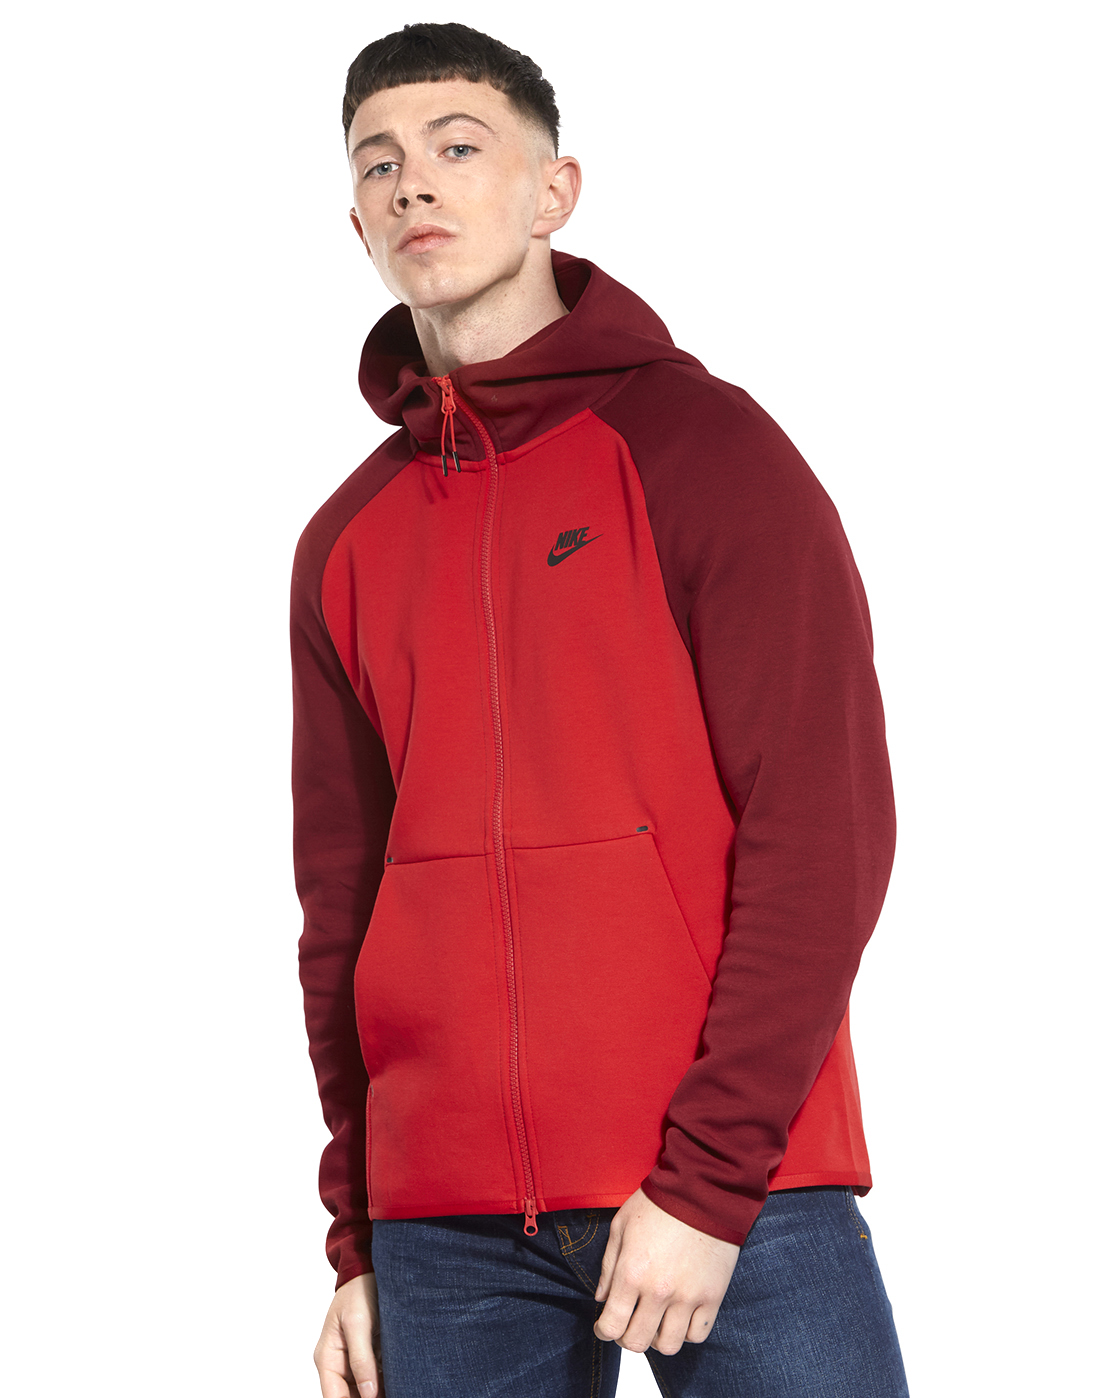 b5b6a4cdc50f Nike. Mens Tech Fleece Hoody. Mens Tech Fleece Hoody ...